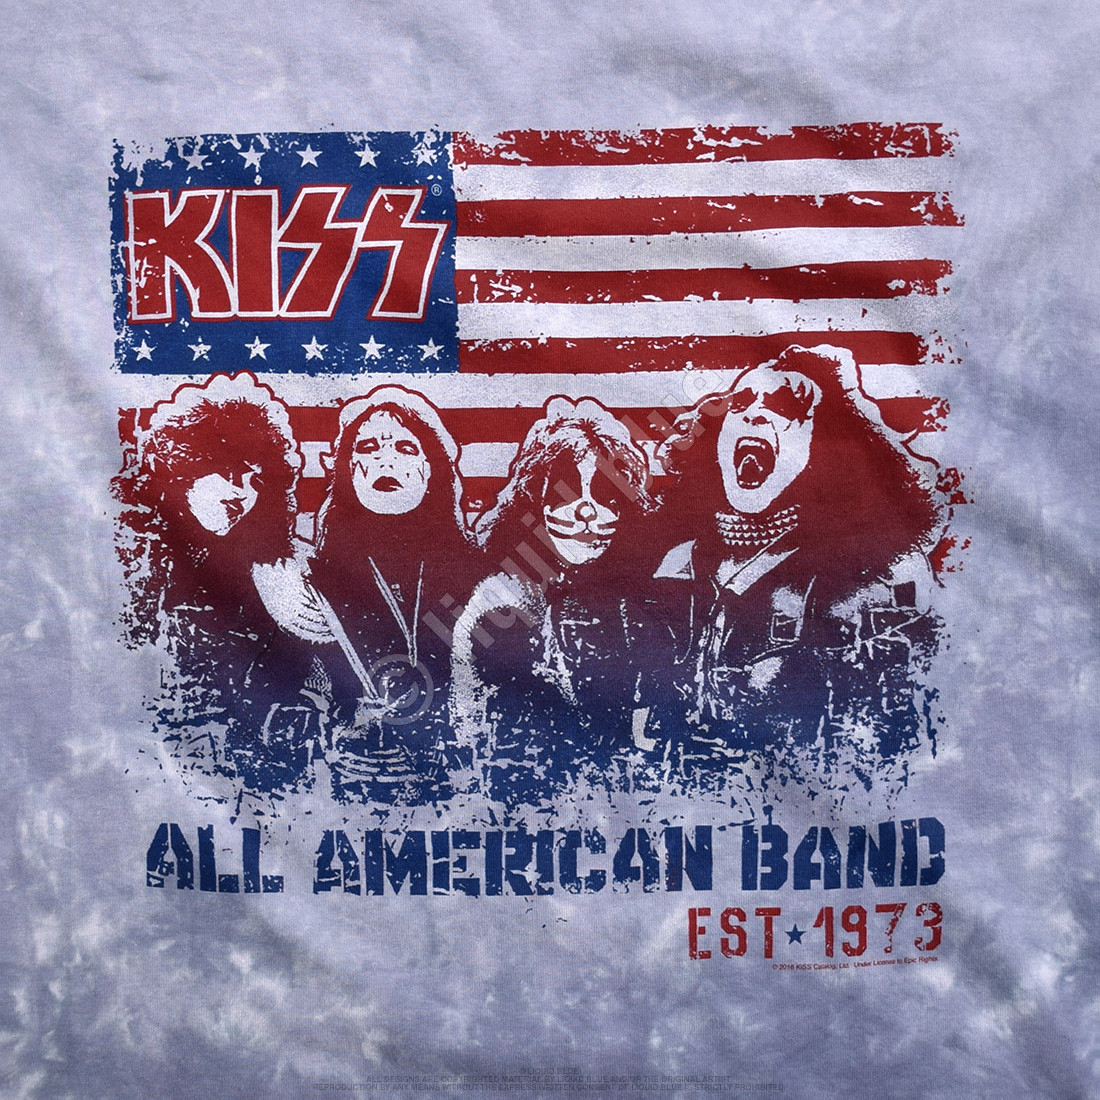 All American Band Tie-Dye T-Shirt